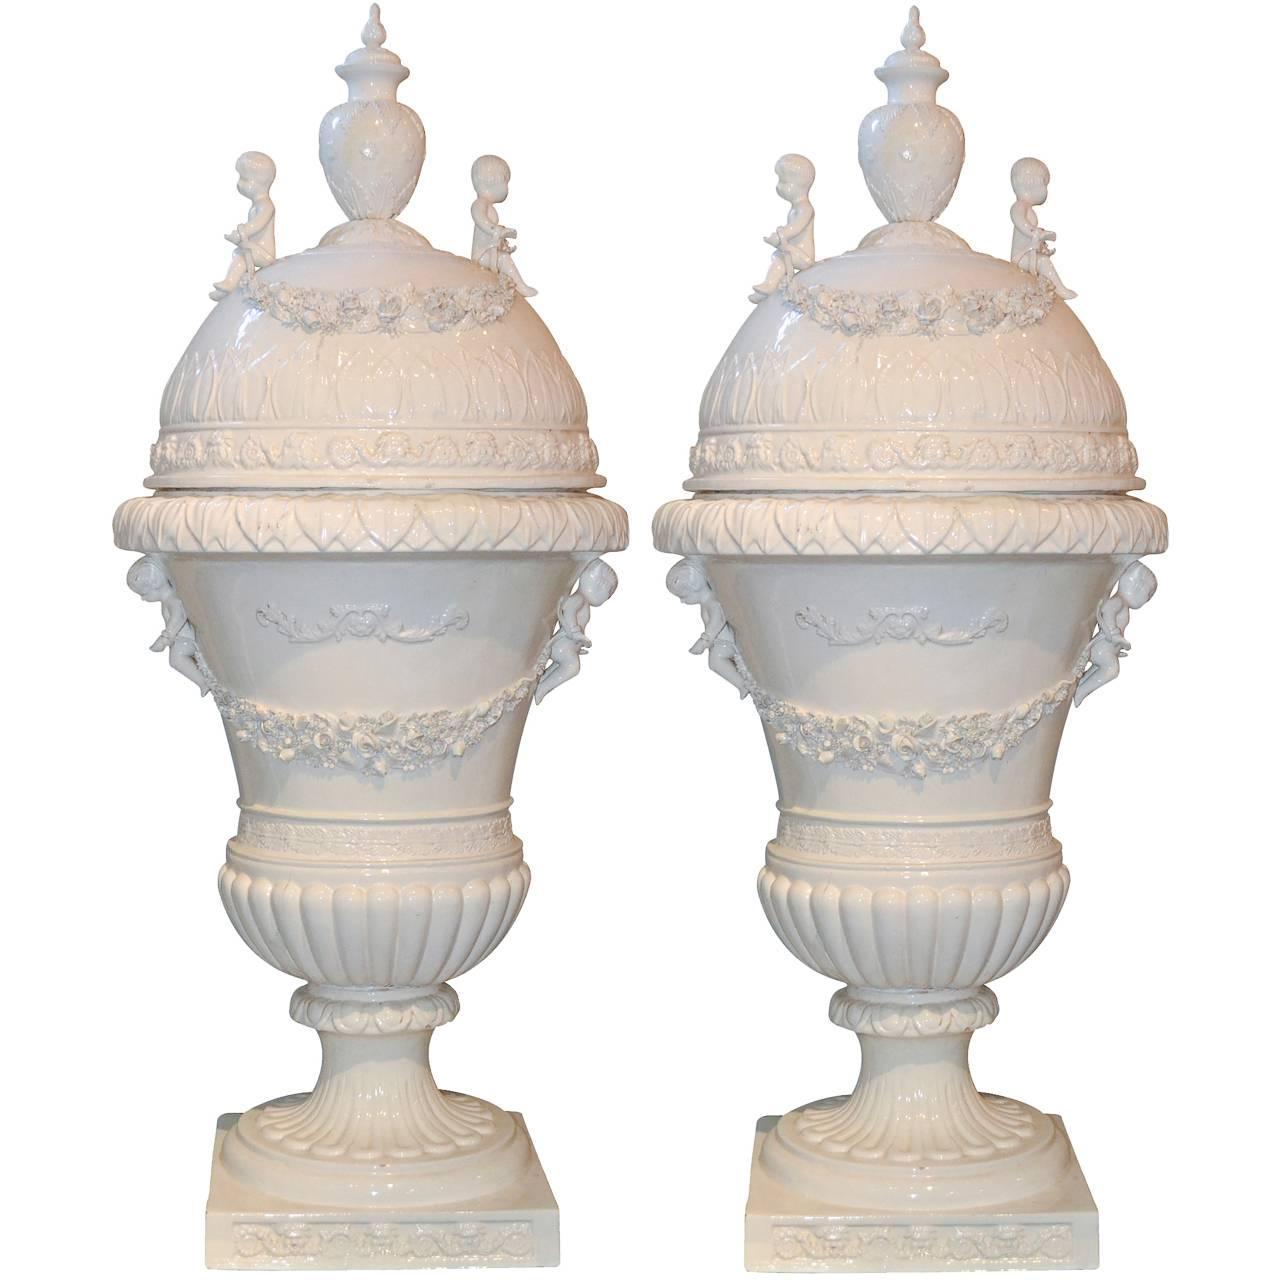 Great Pair of Italian Glazed Porcelain Capped Urns